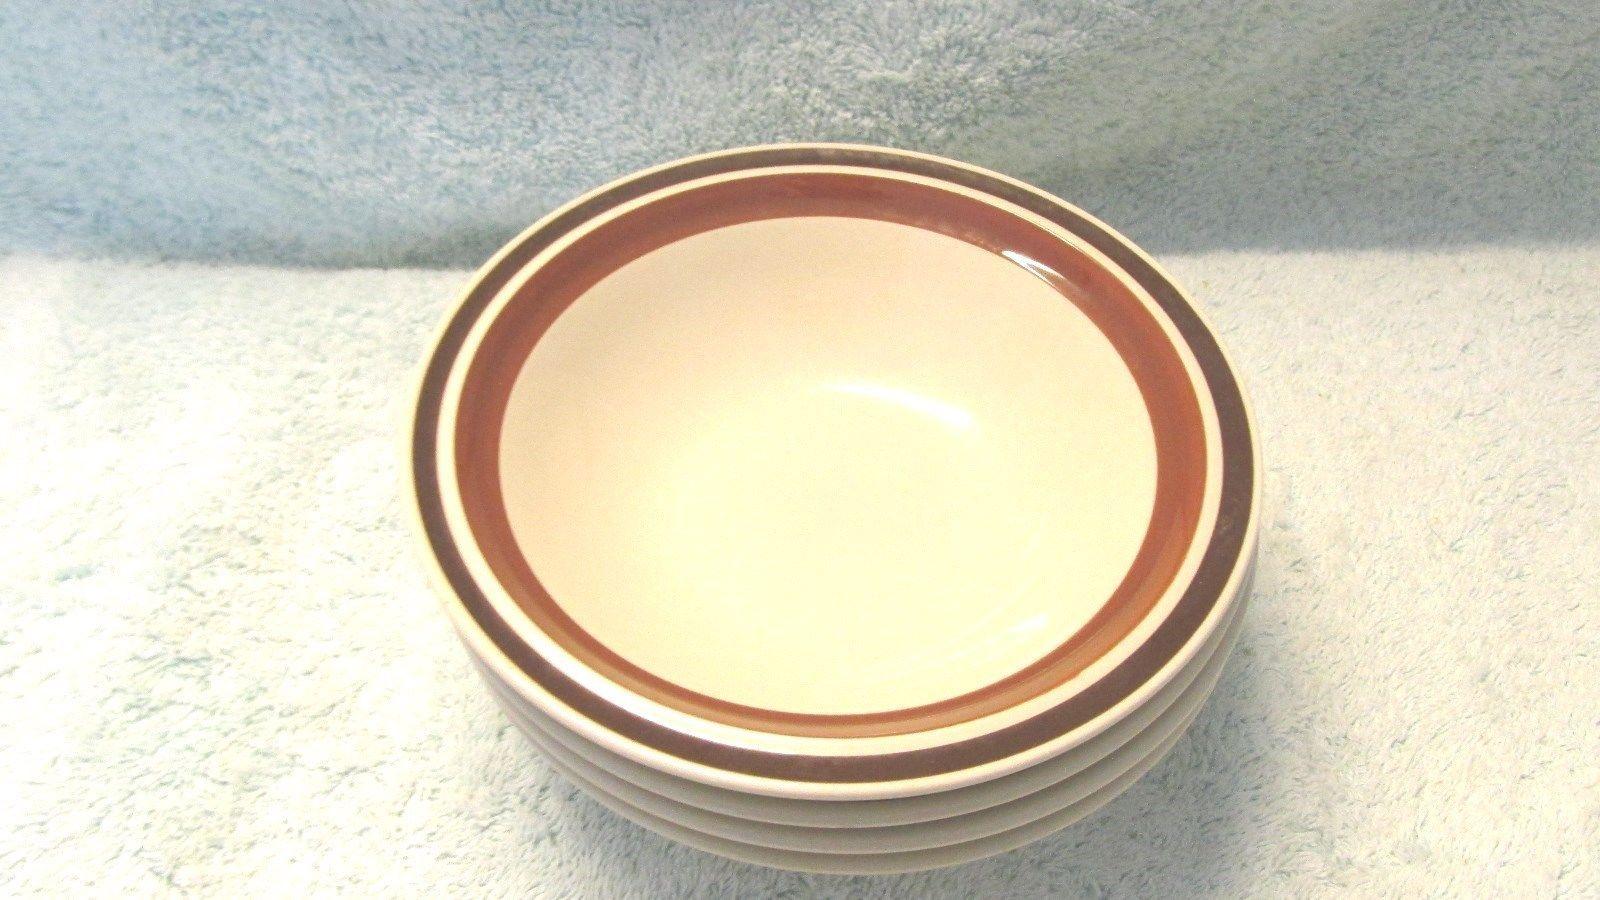 Hearthside Stoneware: 10 listings